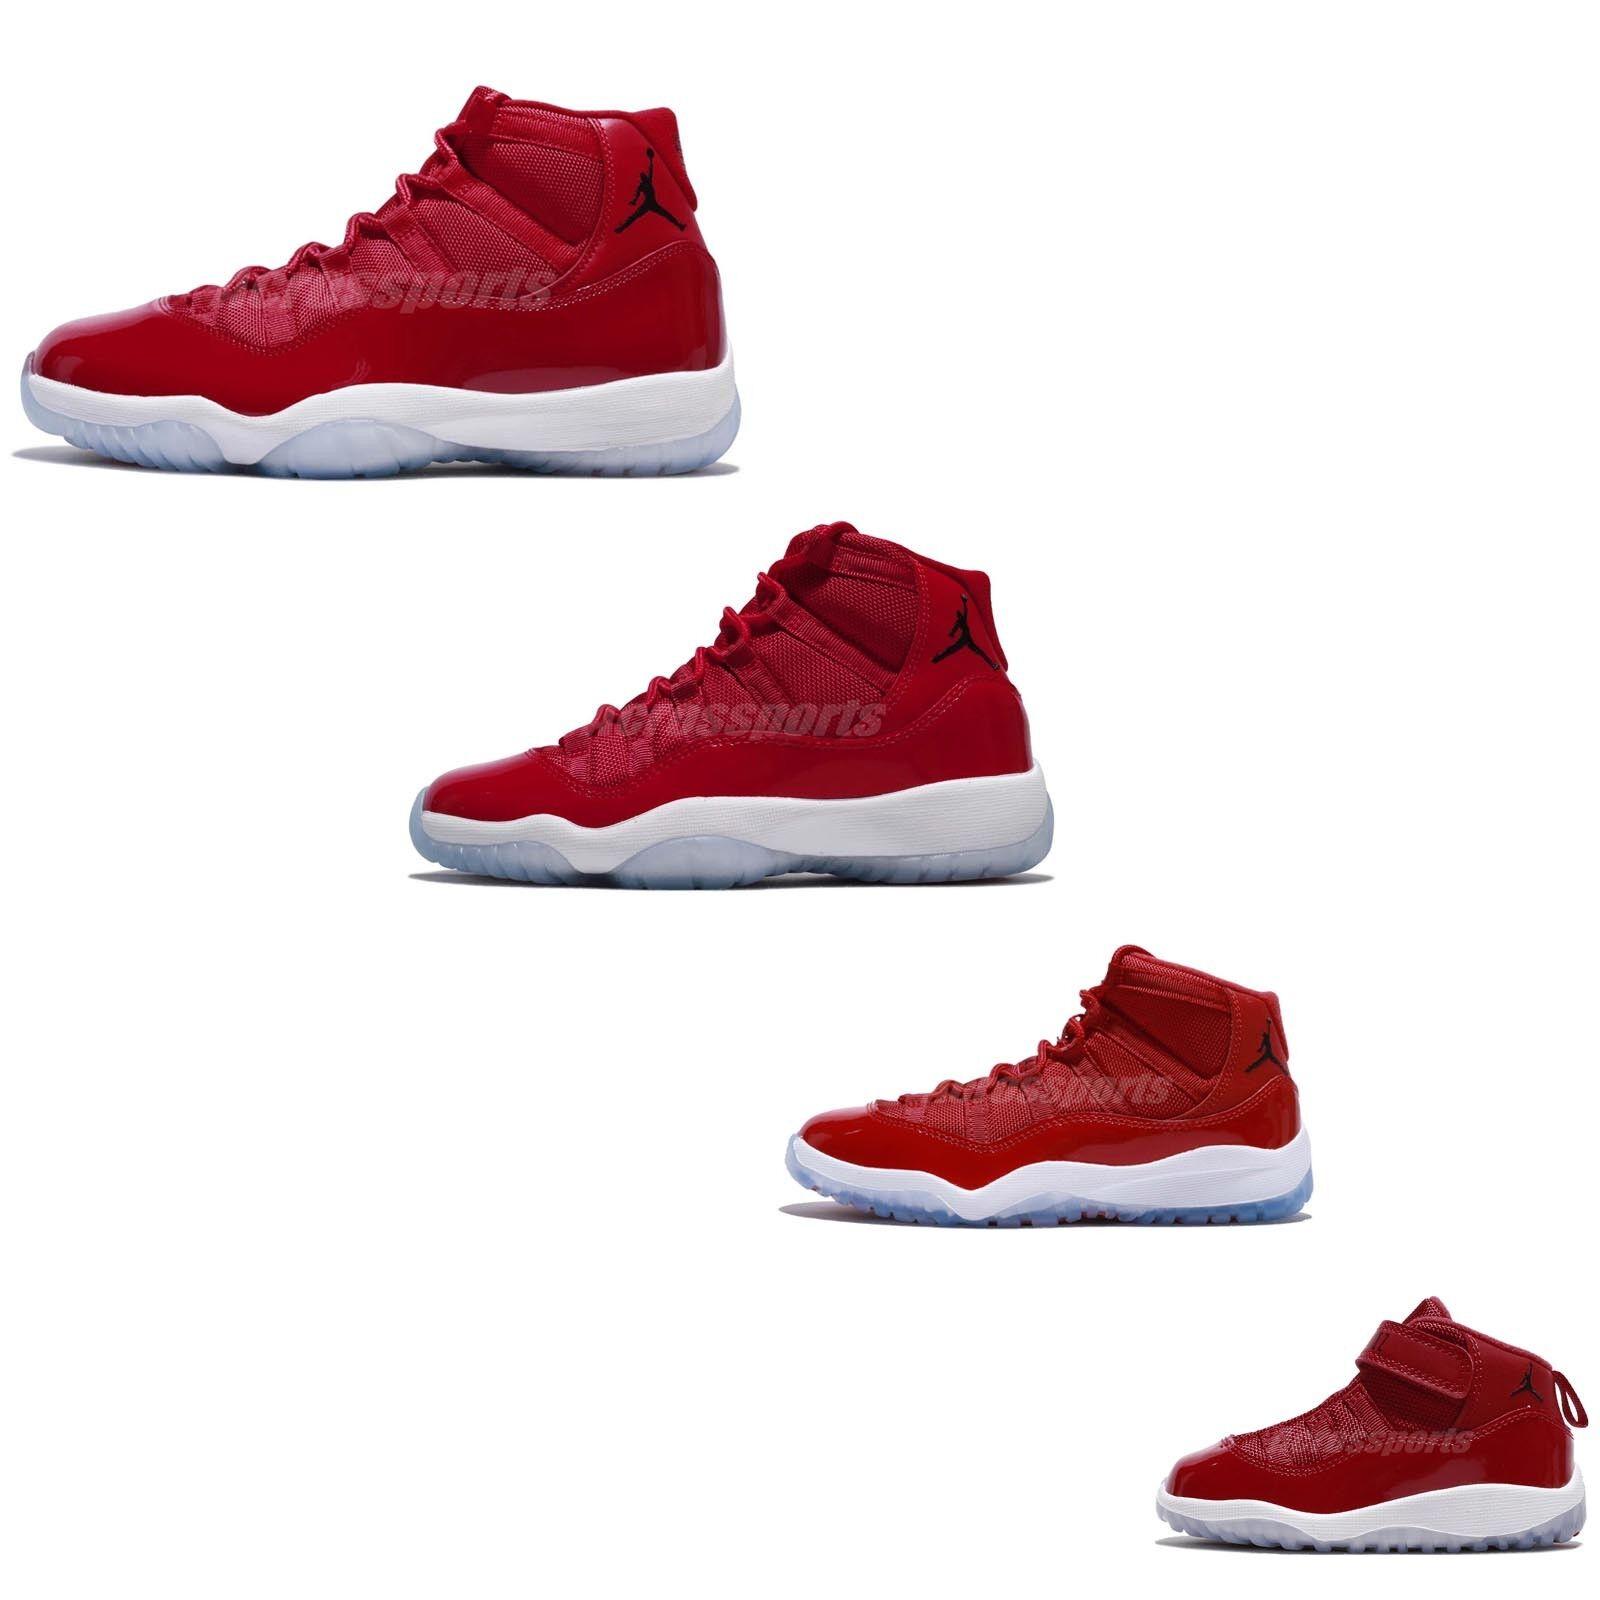 c2ff611bcb5cc8 Nike Air Jordan 11 XI Retro